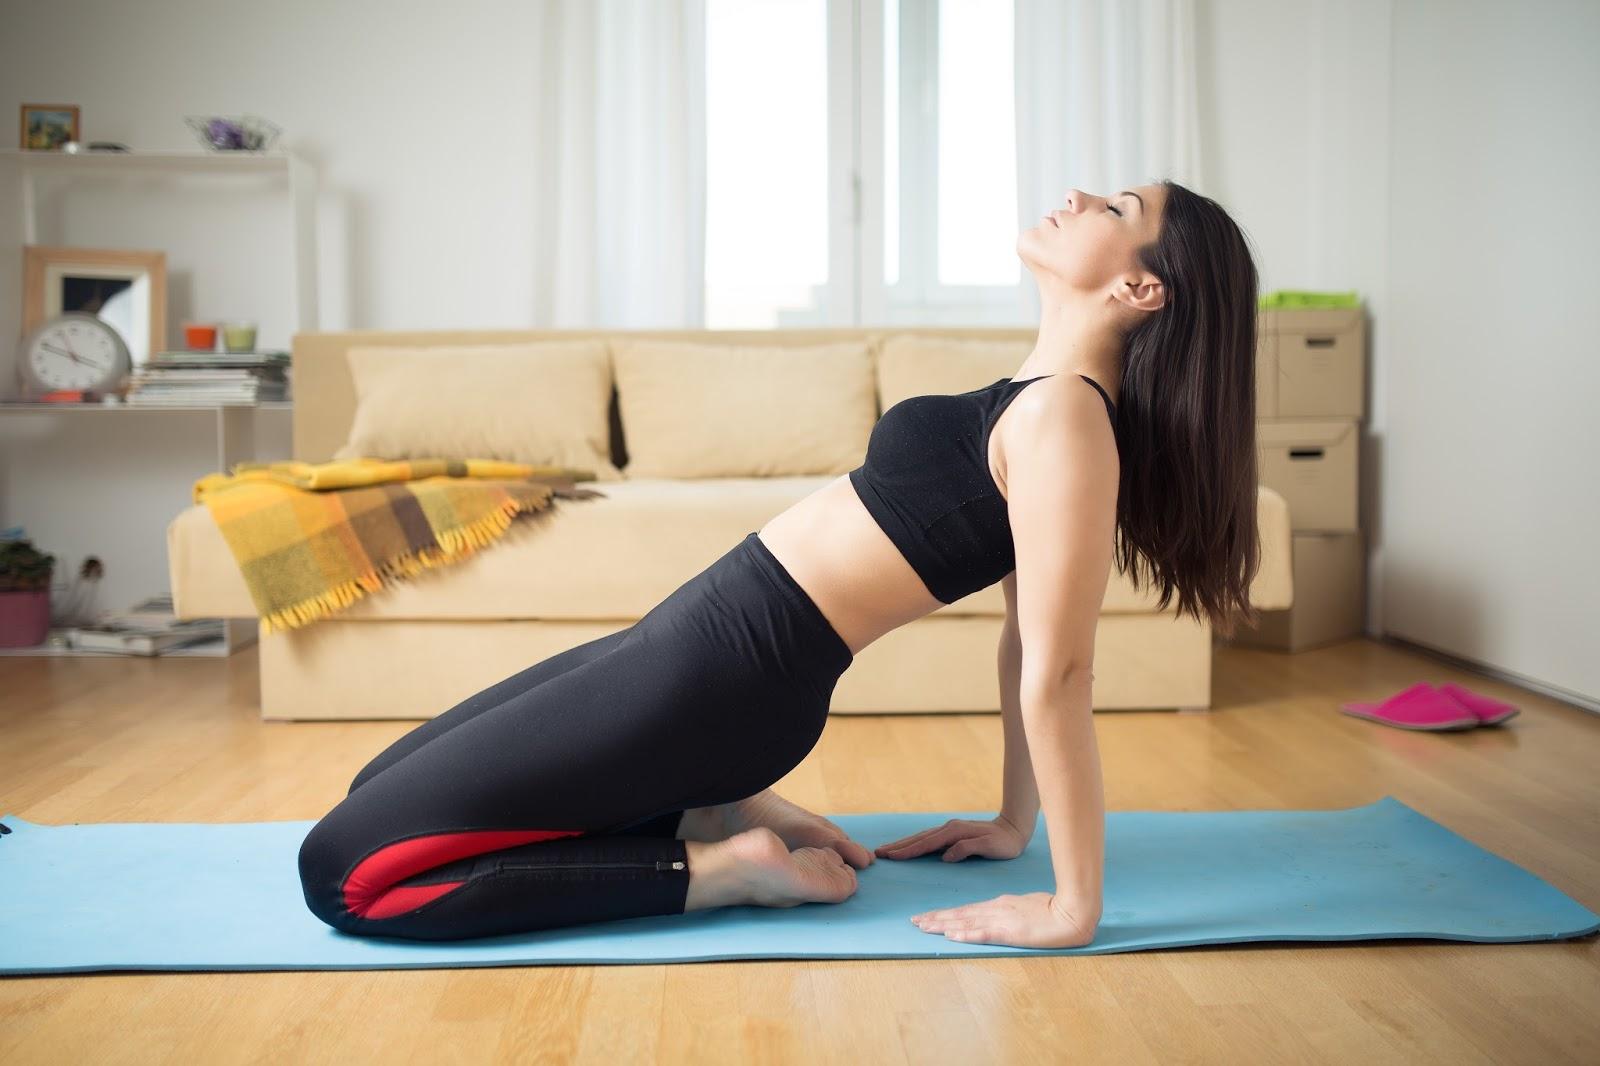 Yoga by jimena seis consejos para practicar yoga en casa - Clases de yoga en casa ...